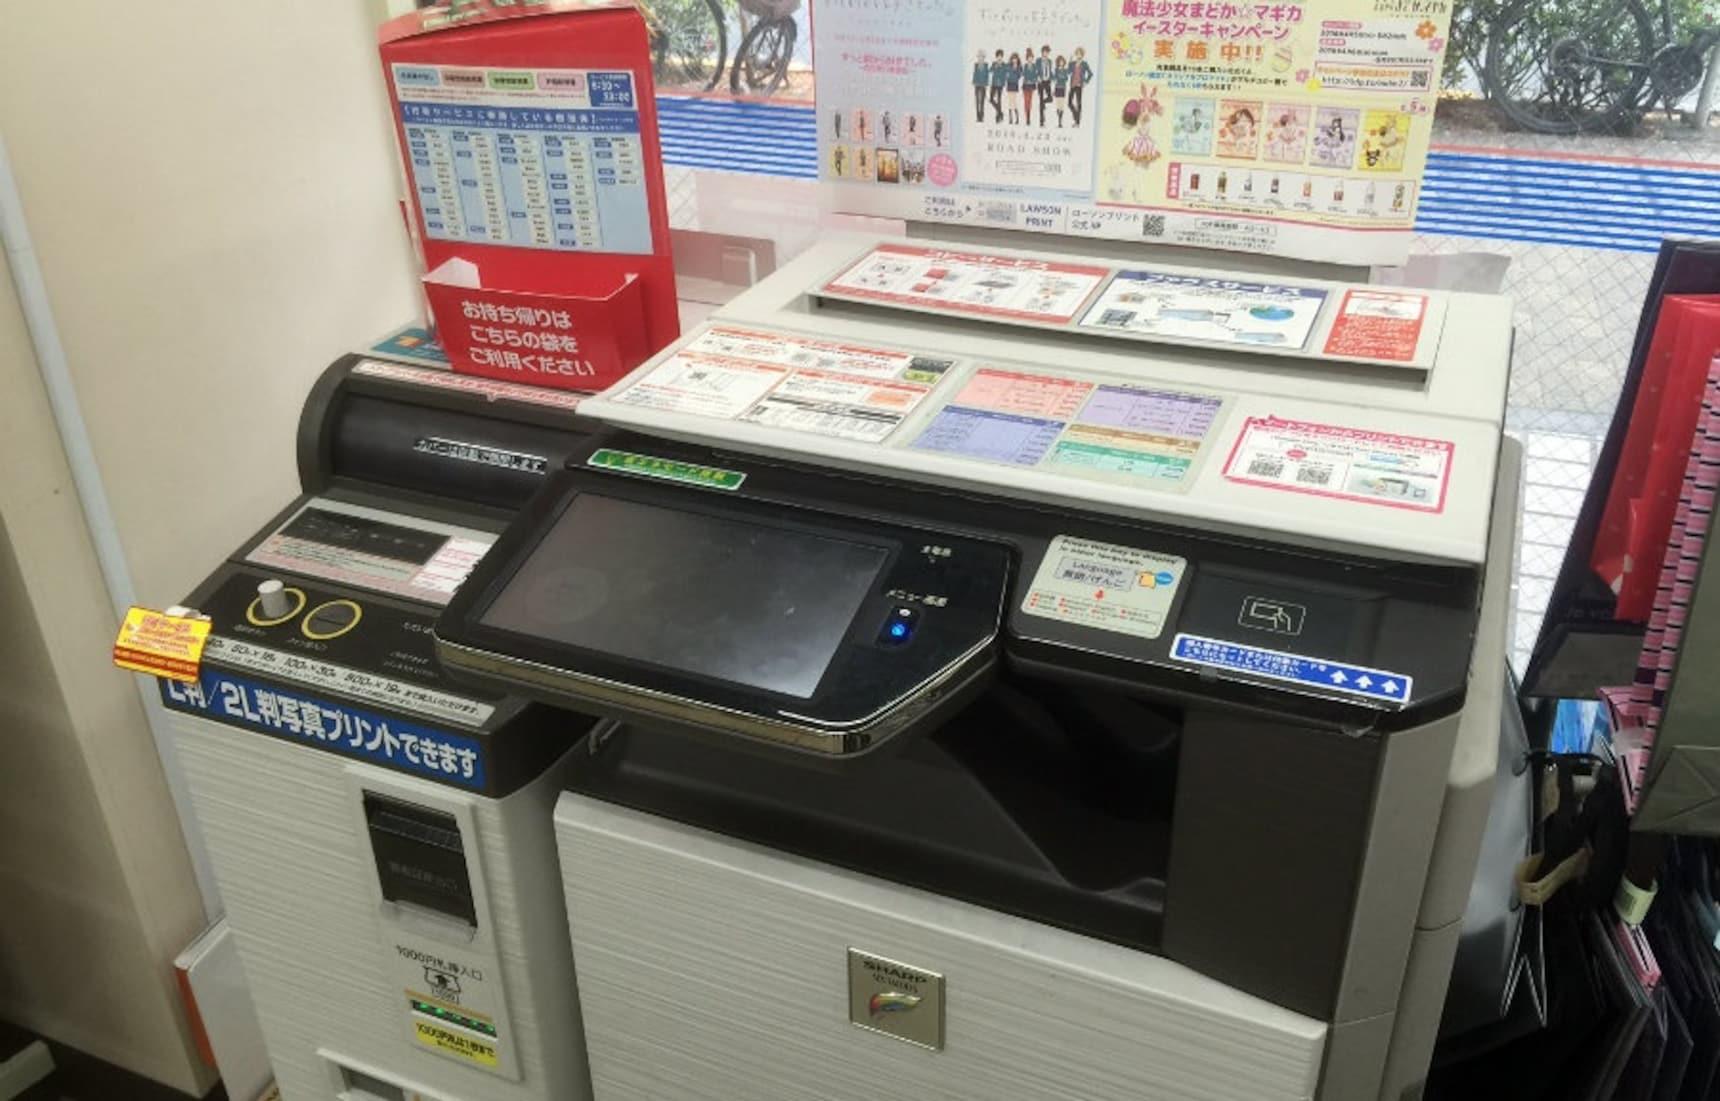 The Secrets of the Lawson Copy Machine